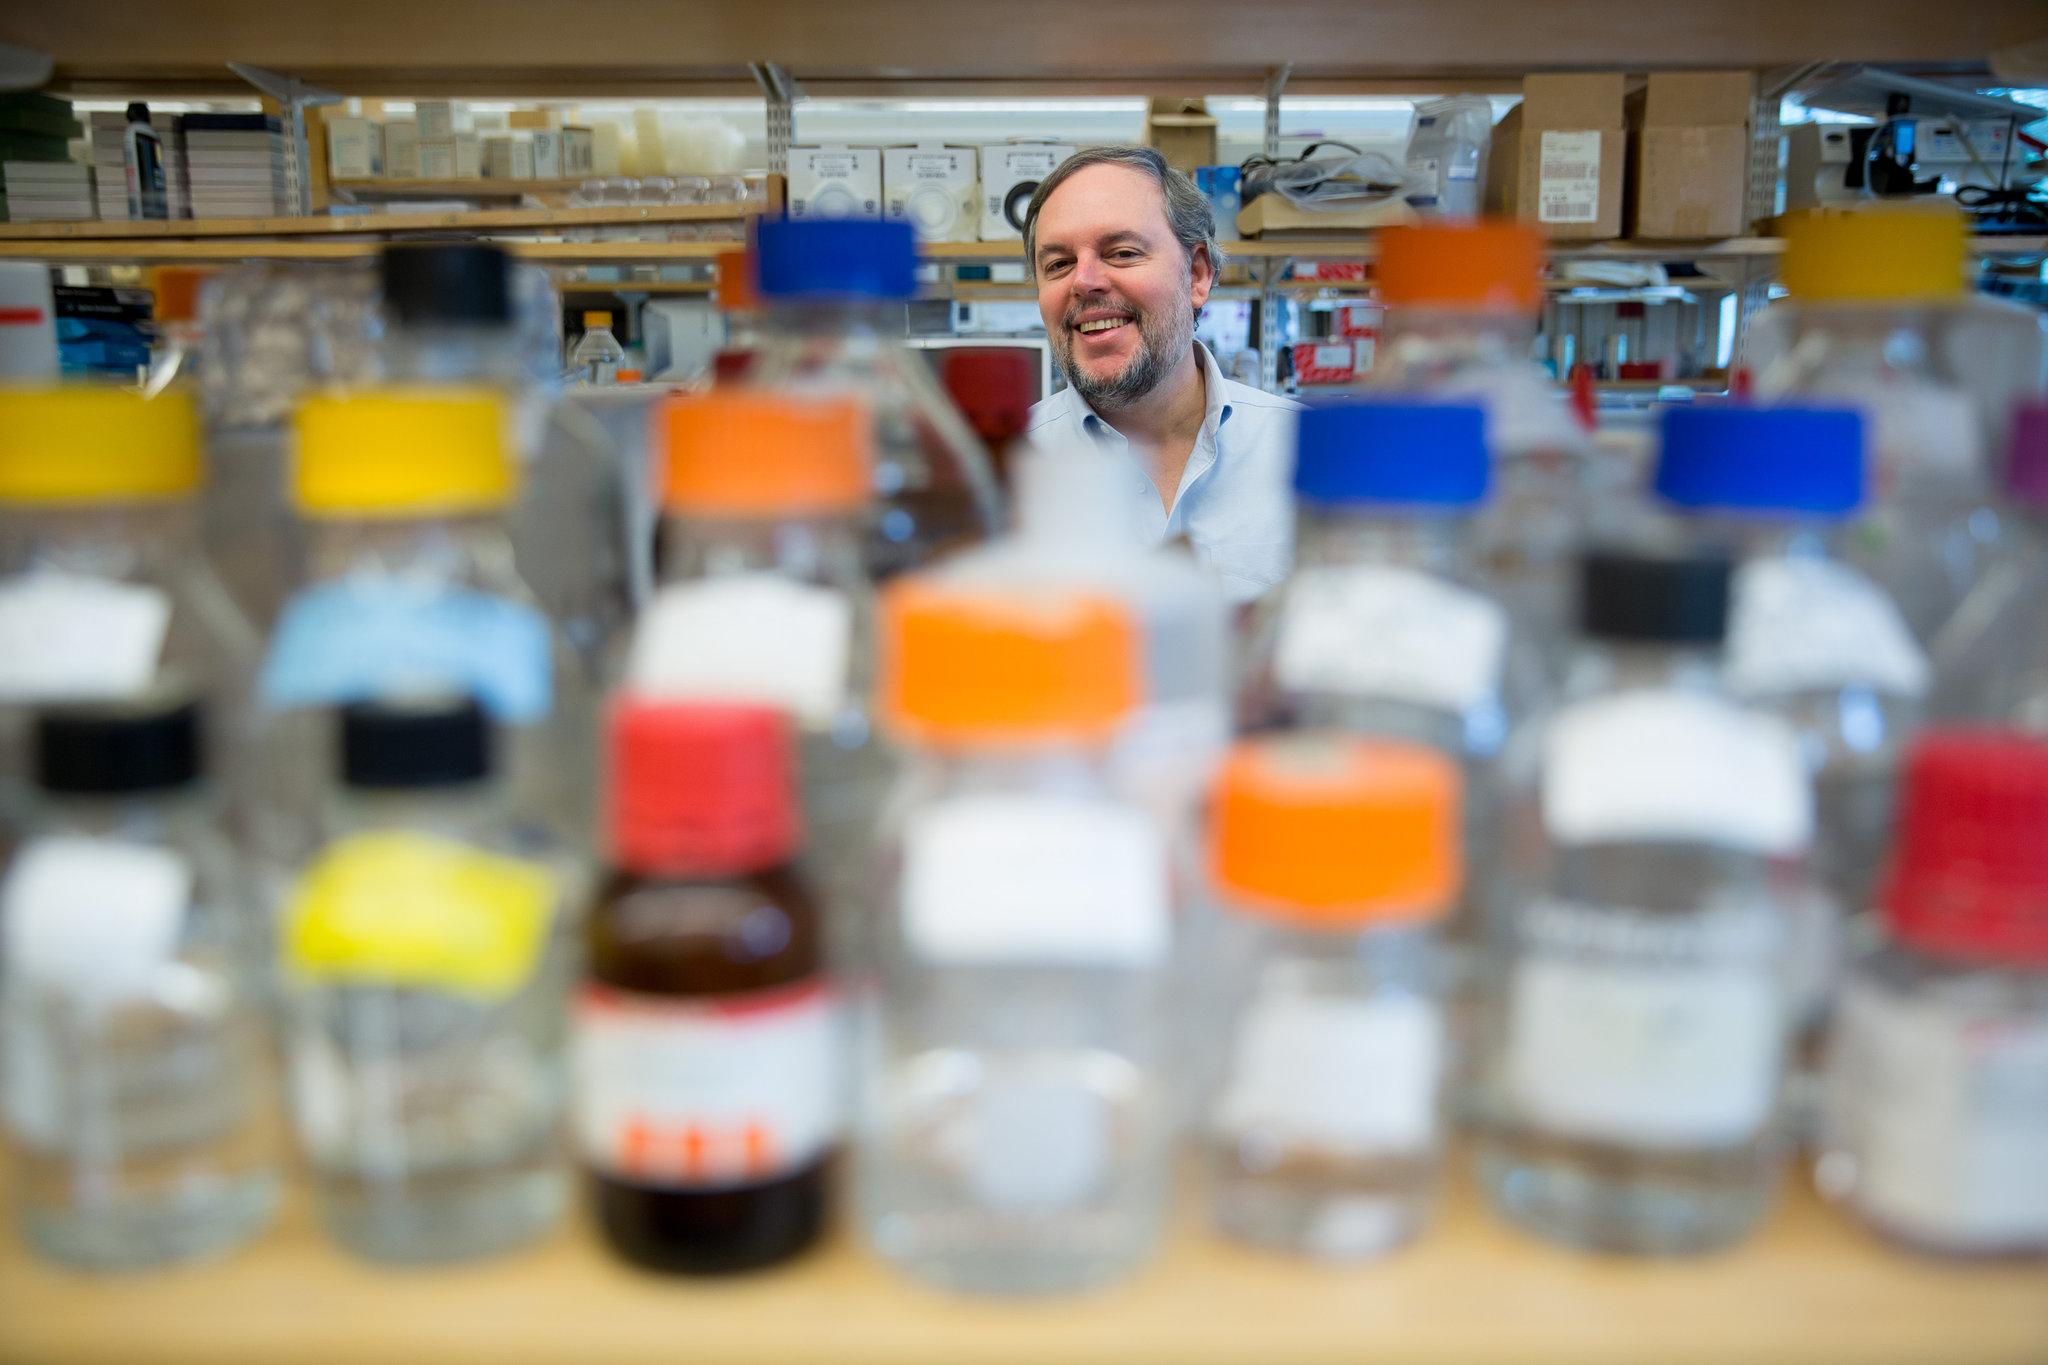 Novo exame de sangue pode revolucionar a medicina